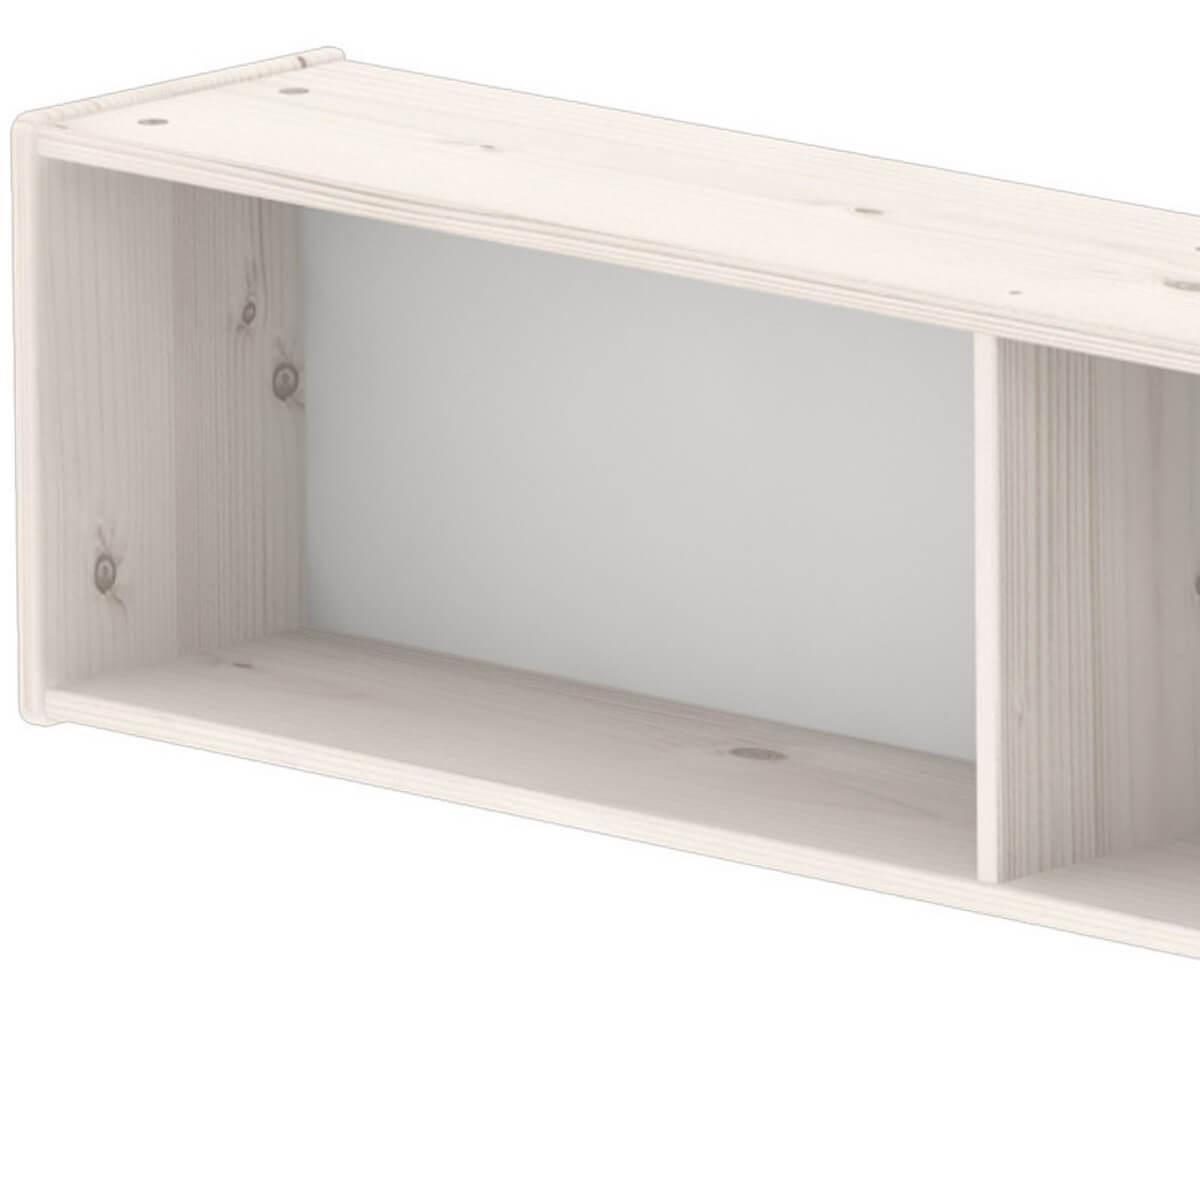 Estantería infantil de pared compartimentos 190 cm CLASSIC Flexa blanco cal